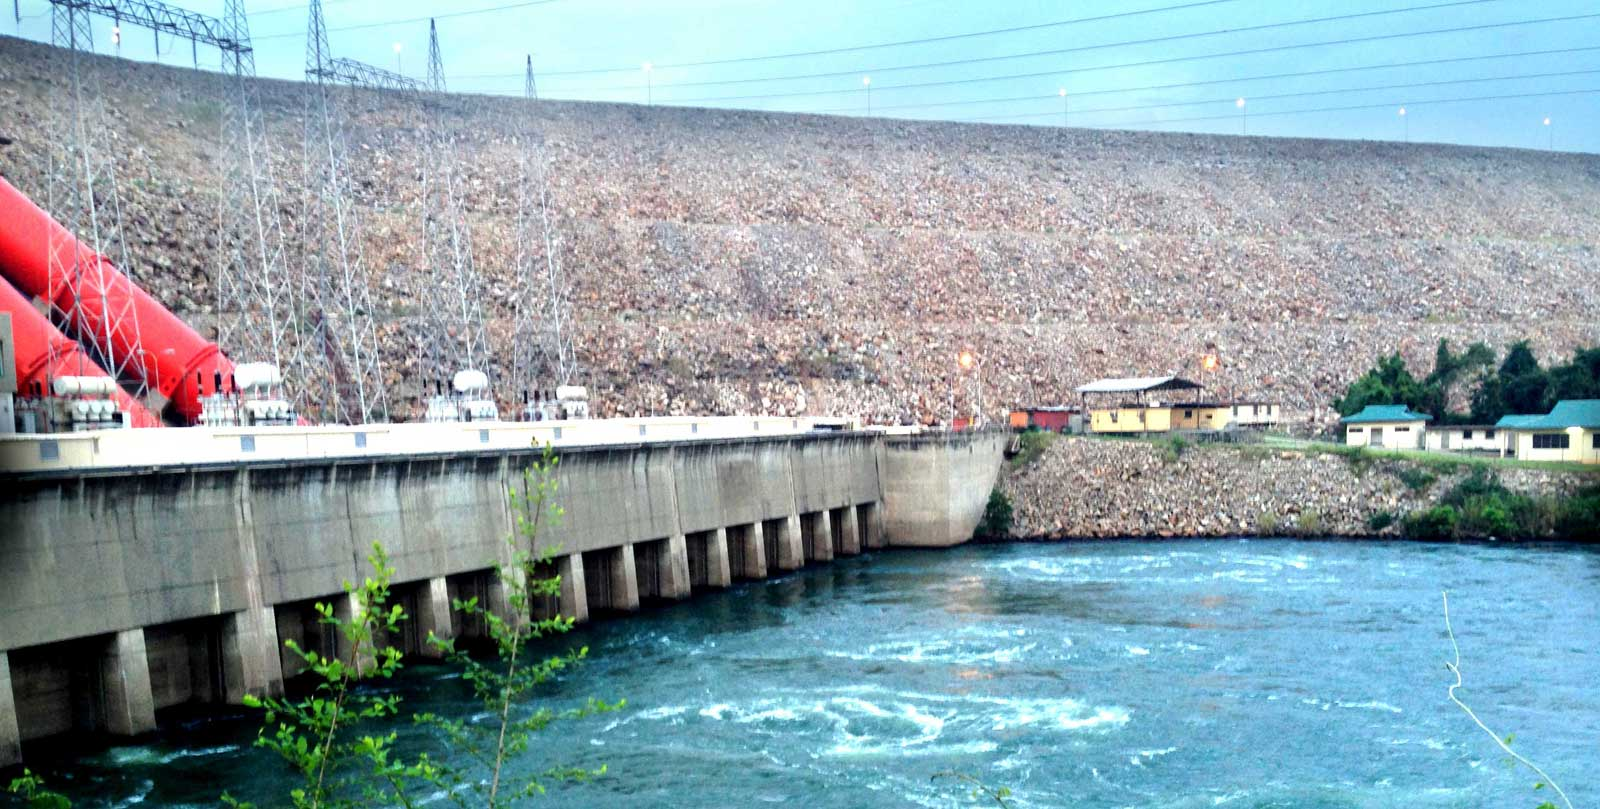 hydro-dam2